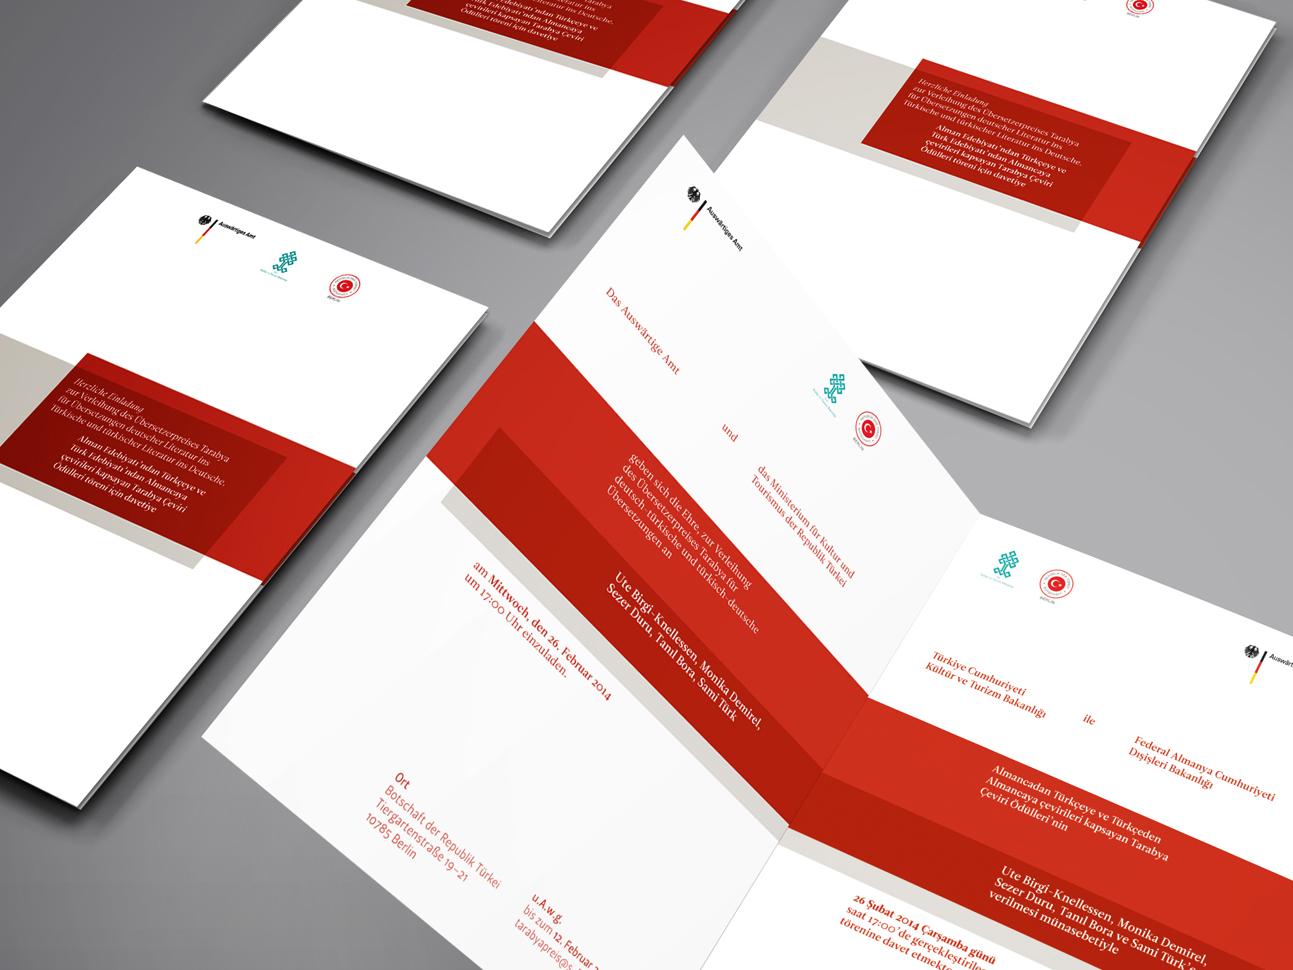 martin_zech_design_projekt_design_tarabya_einladung